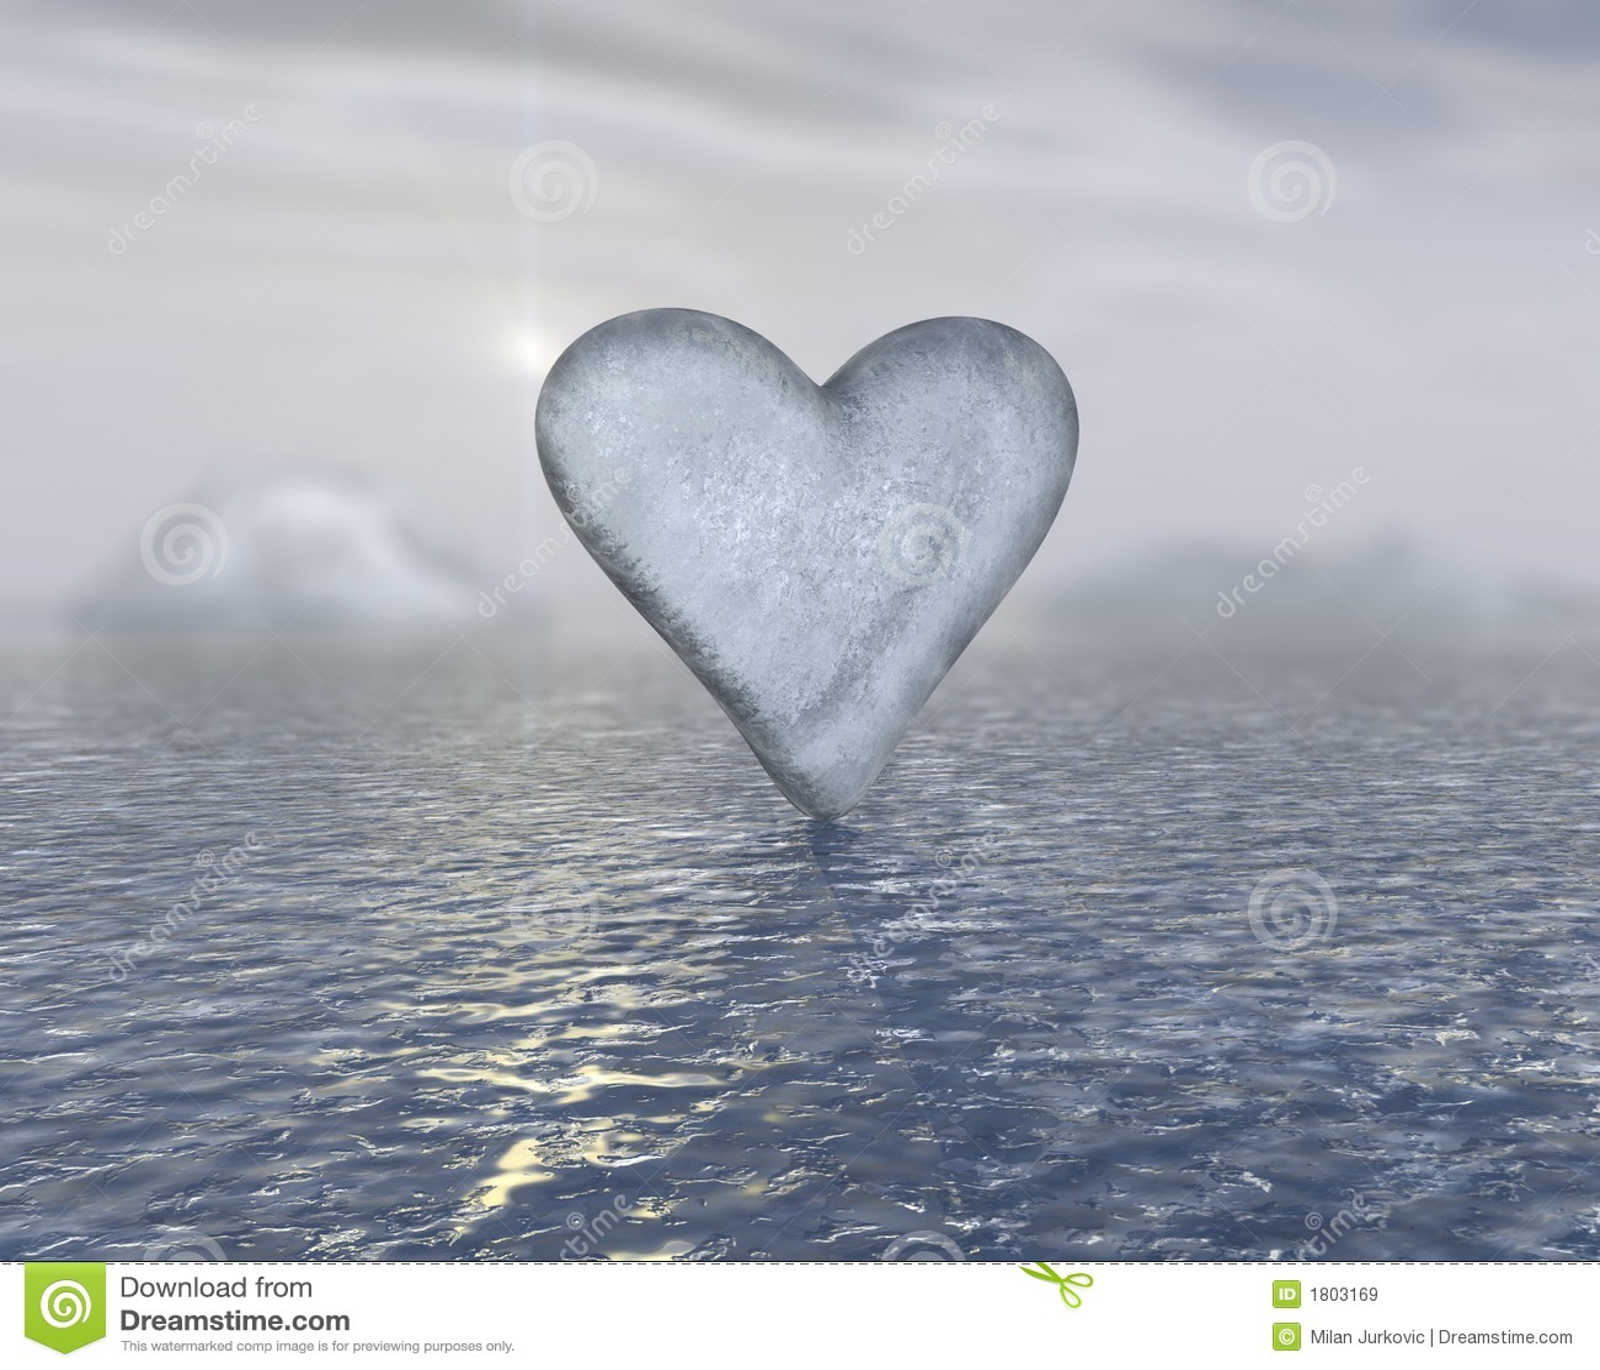 Heart Of Ice Stock Photo - Image: 35664670